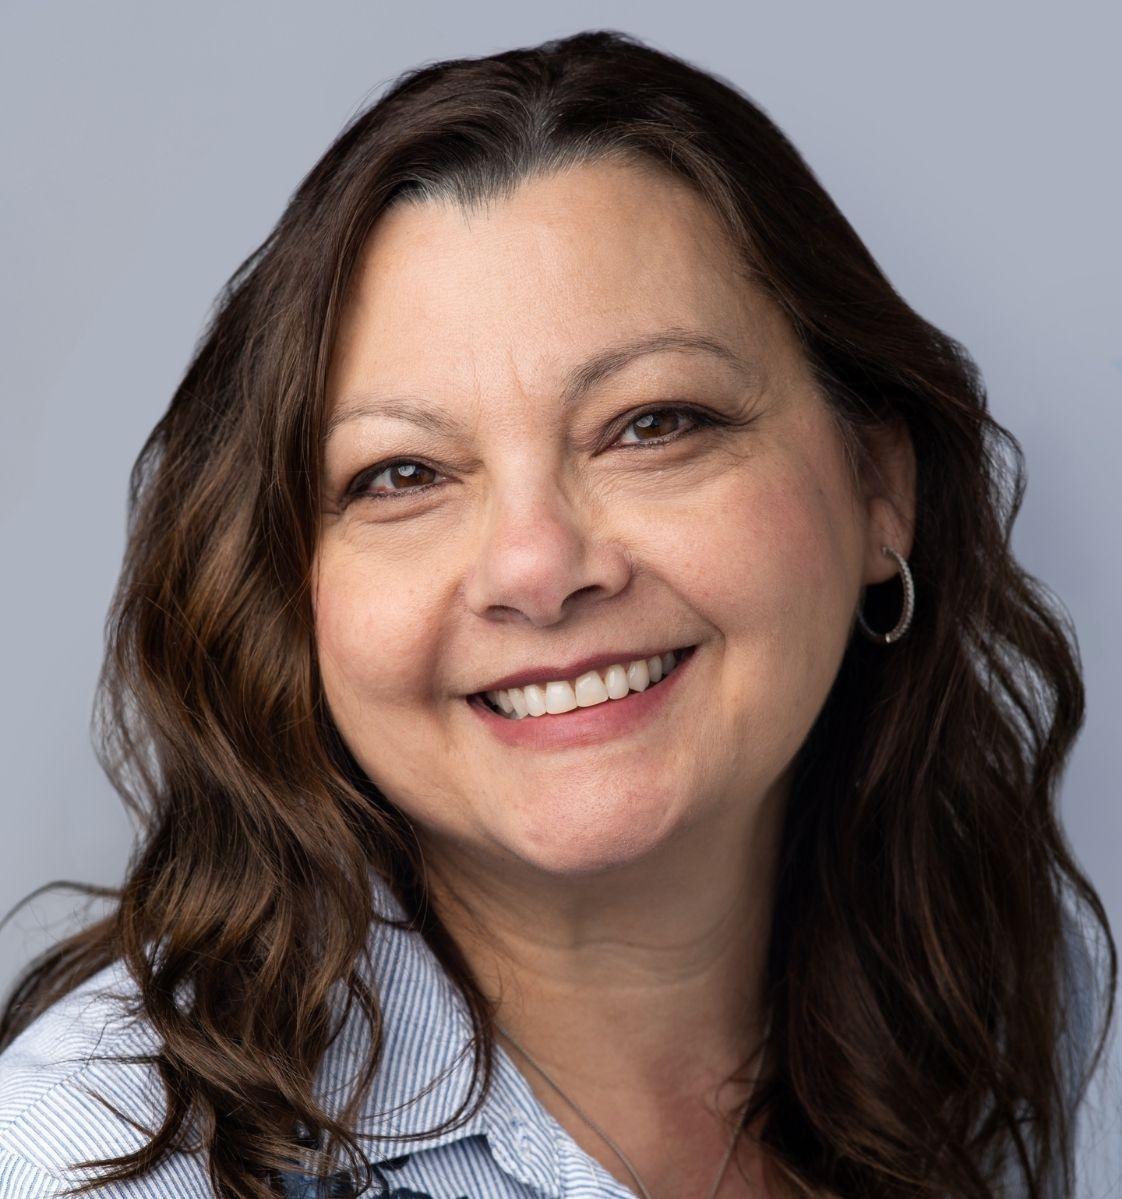 Headshot of Michelina Crecco